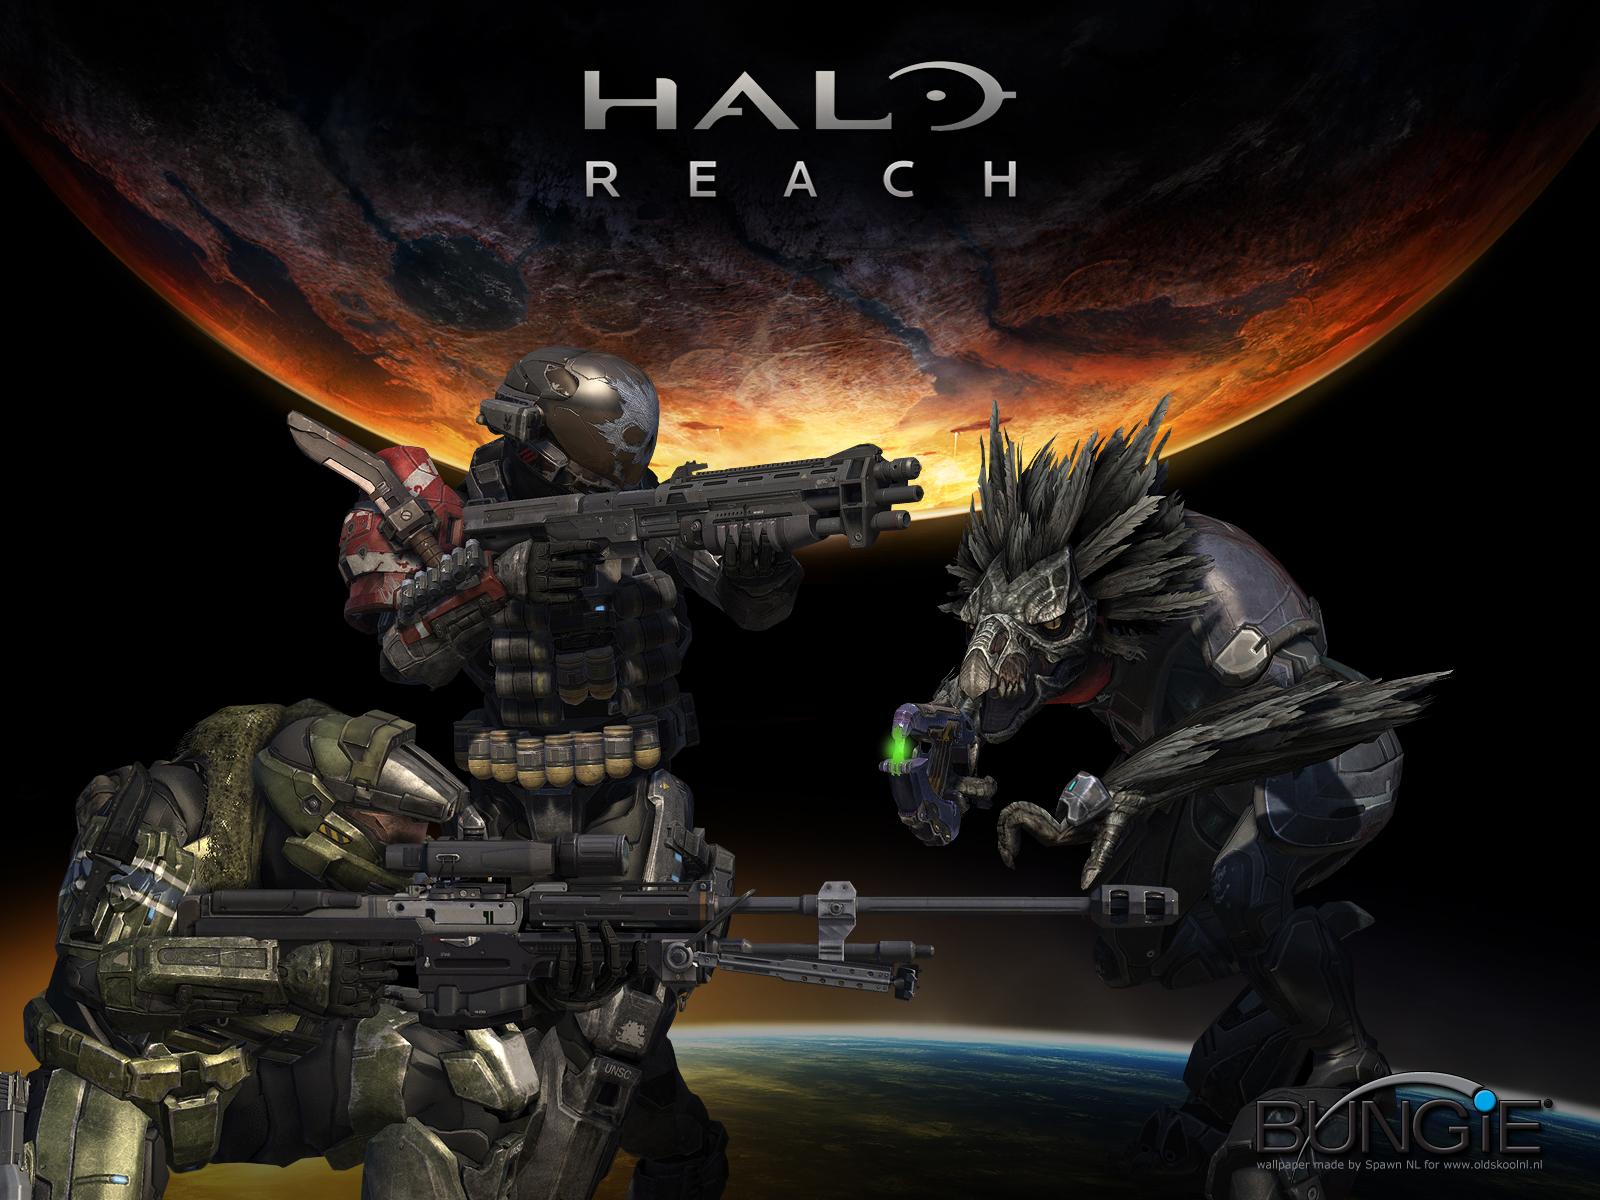 49+] Halo Legendary Wallpaper on WallpaperSafari